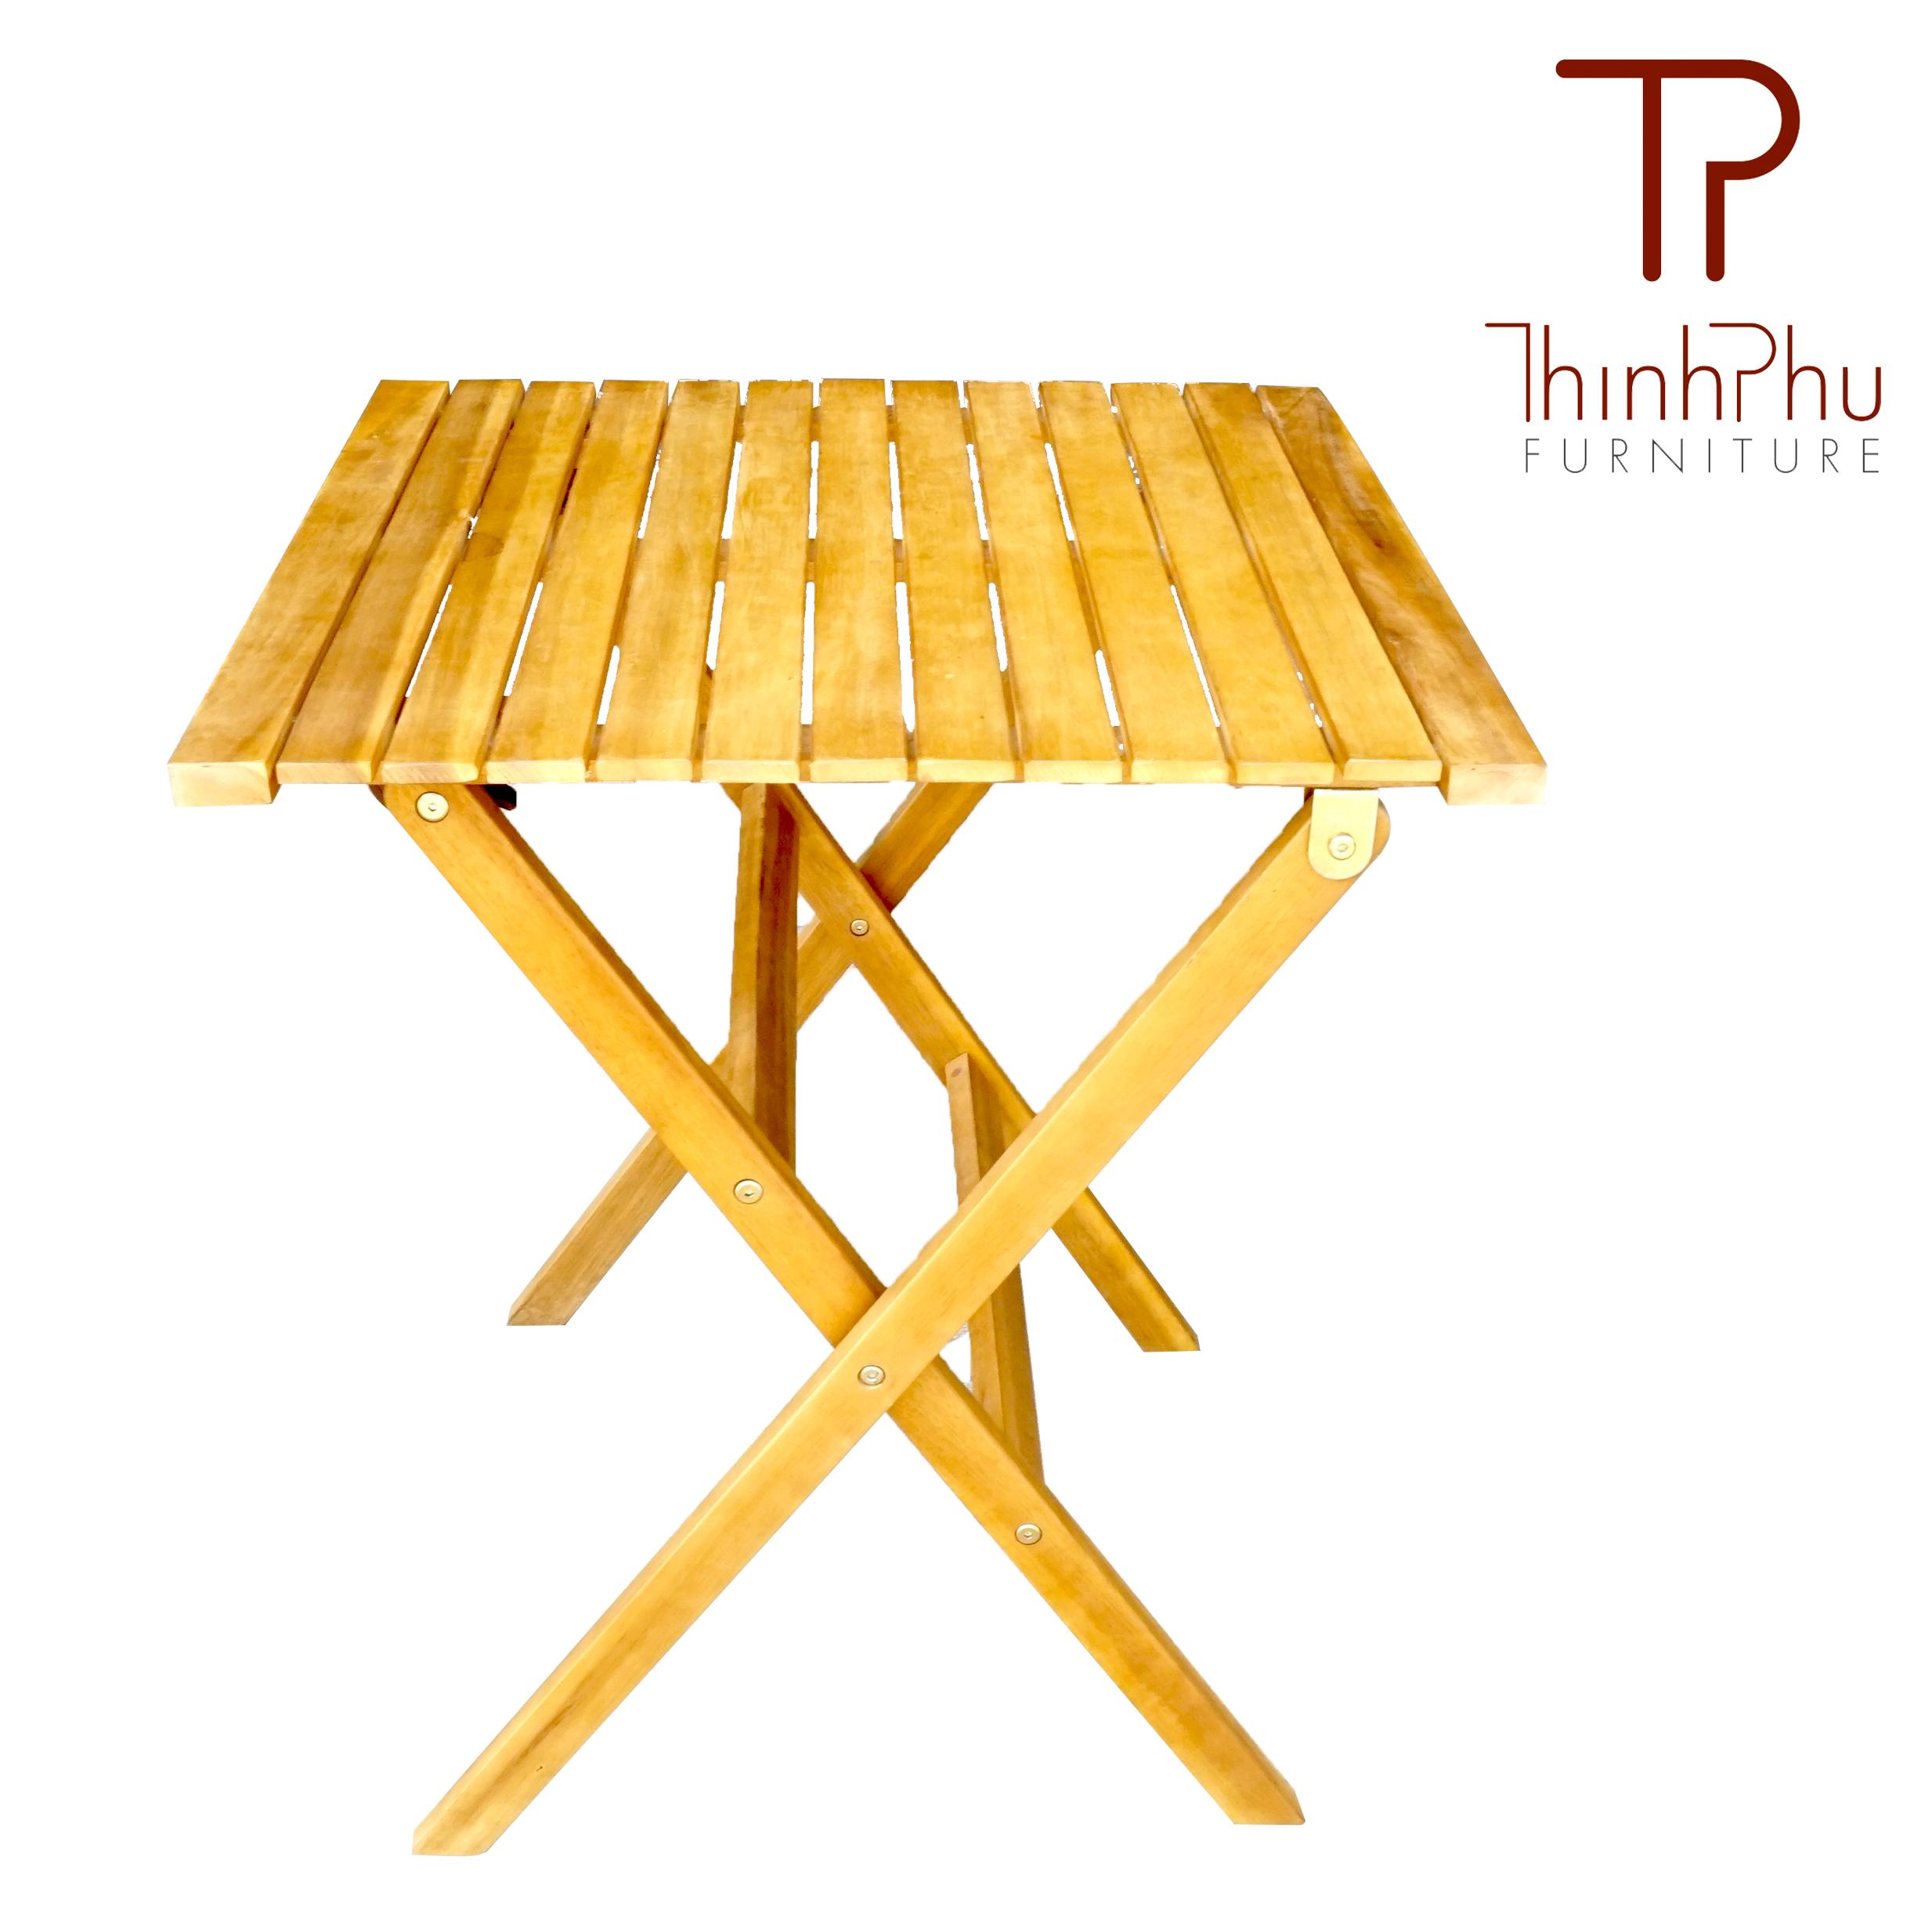 garden-folding-table-bistro-set-DAISY  sc 1 st  THINH PHU FURNITURE & Bistro set DAISY | THINH PHU FURNITURE